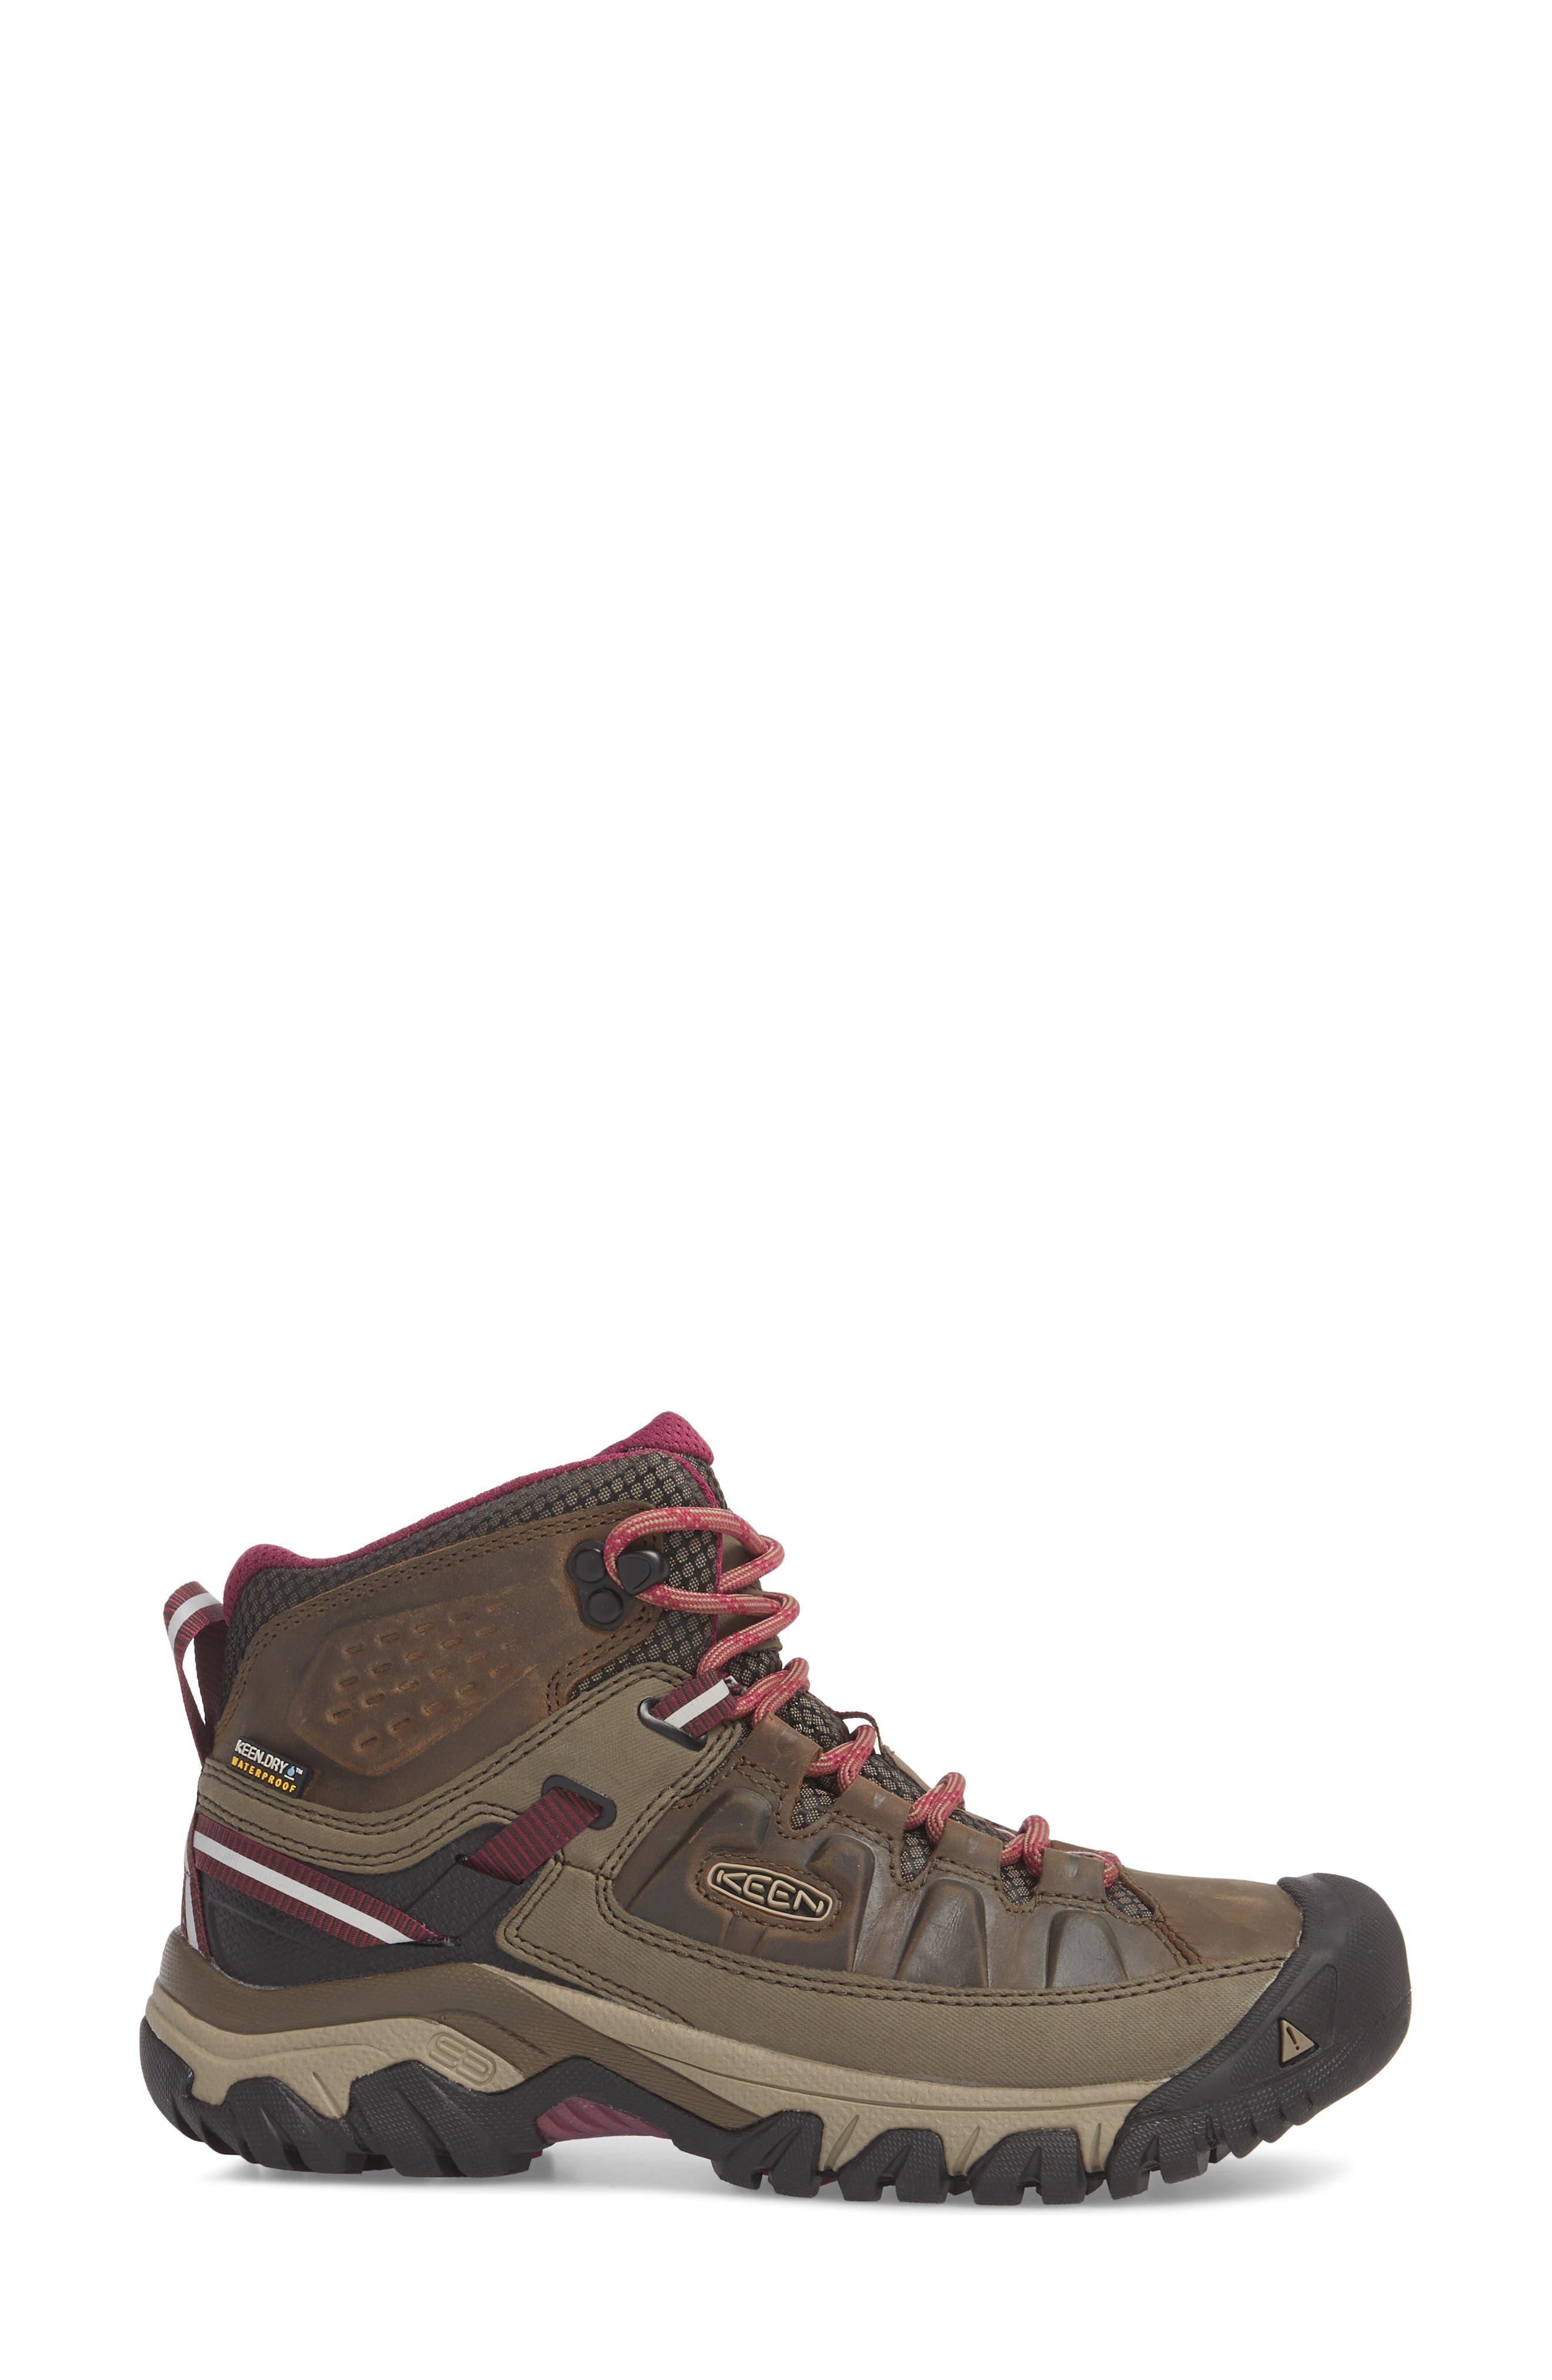 Targhee III Mid Waterproof Hiking Boot,                             Alternate thumbnail 3, color,                             Weiss/ Boysenberry Leather